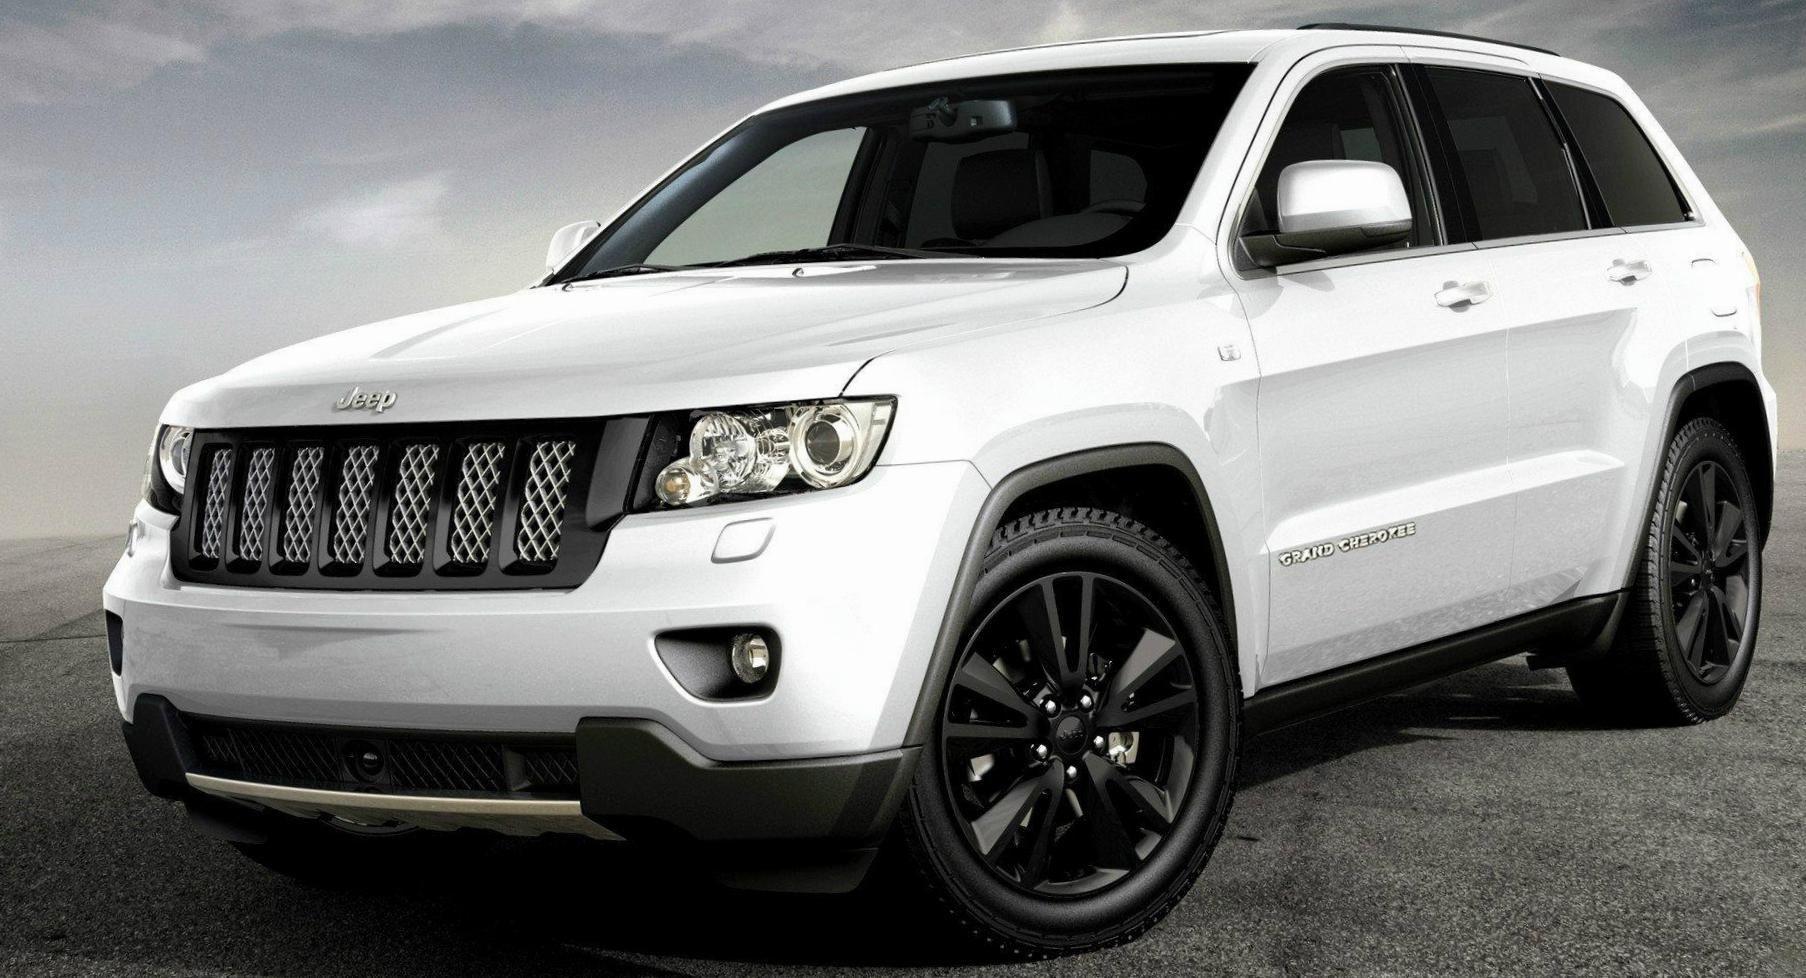 Cherokee Jeep models